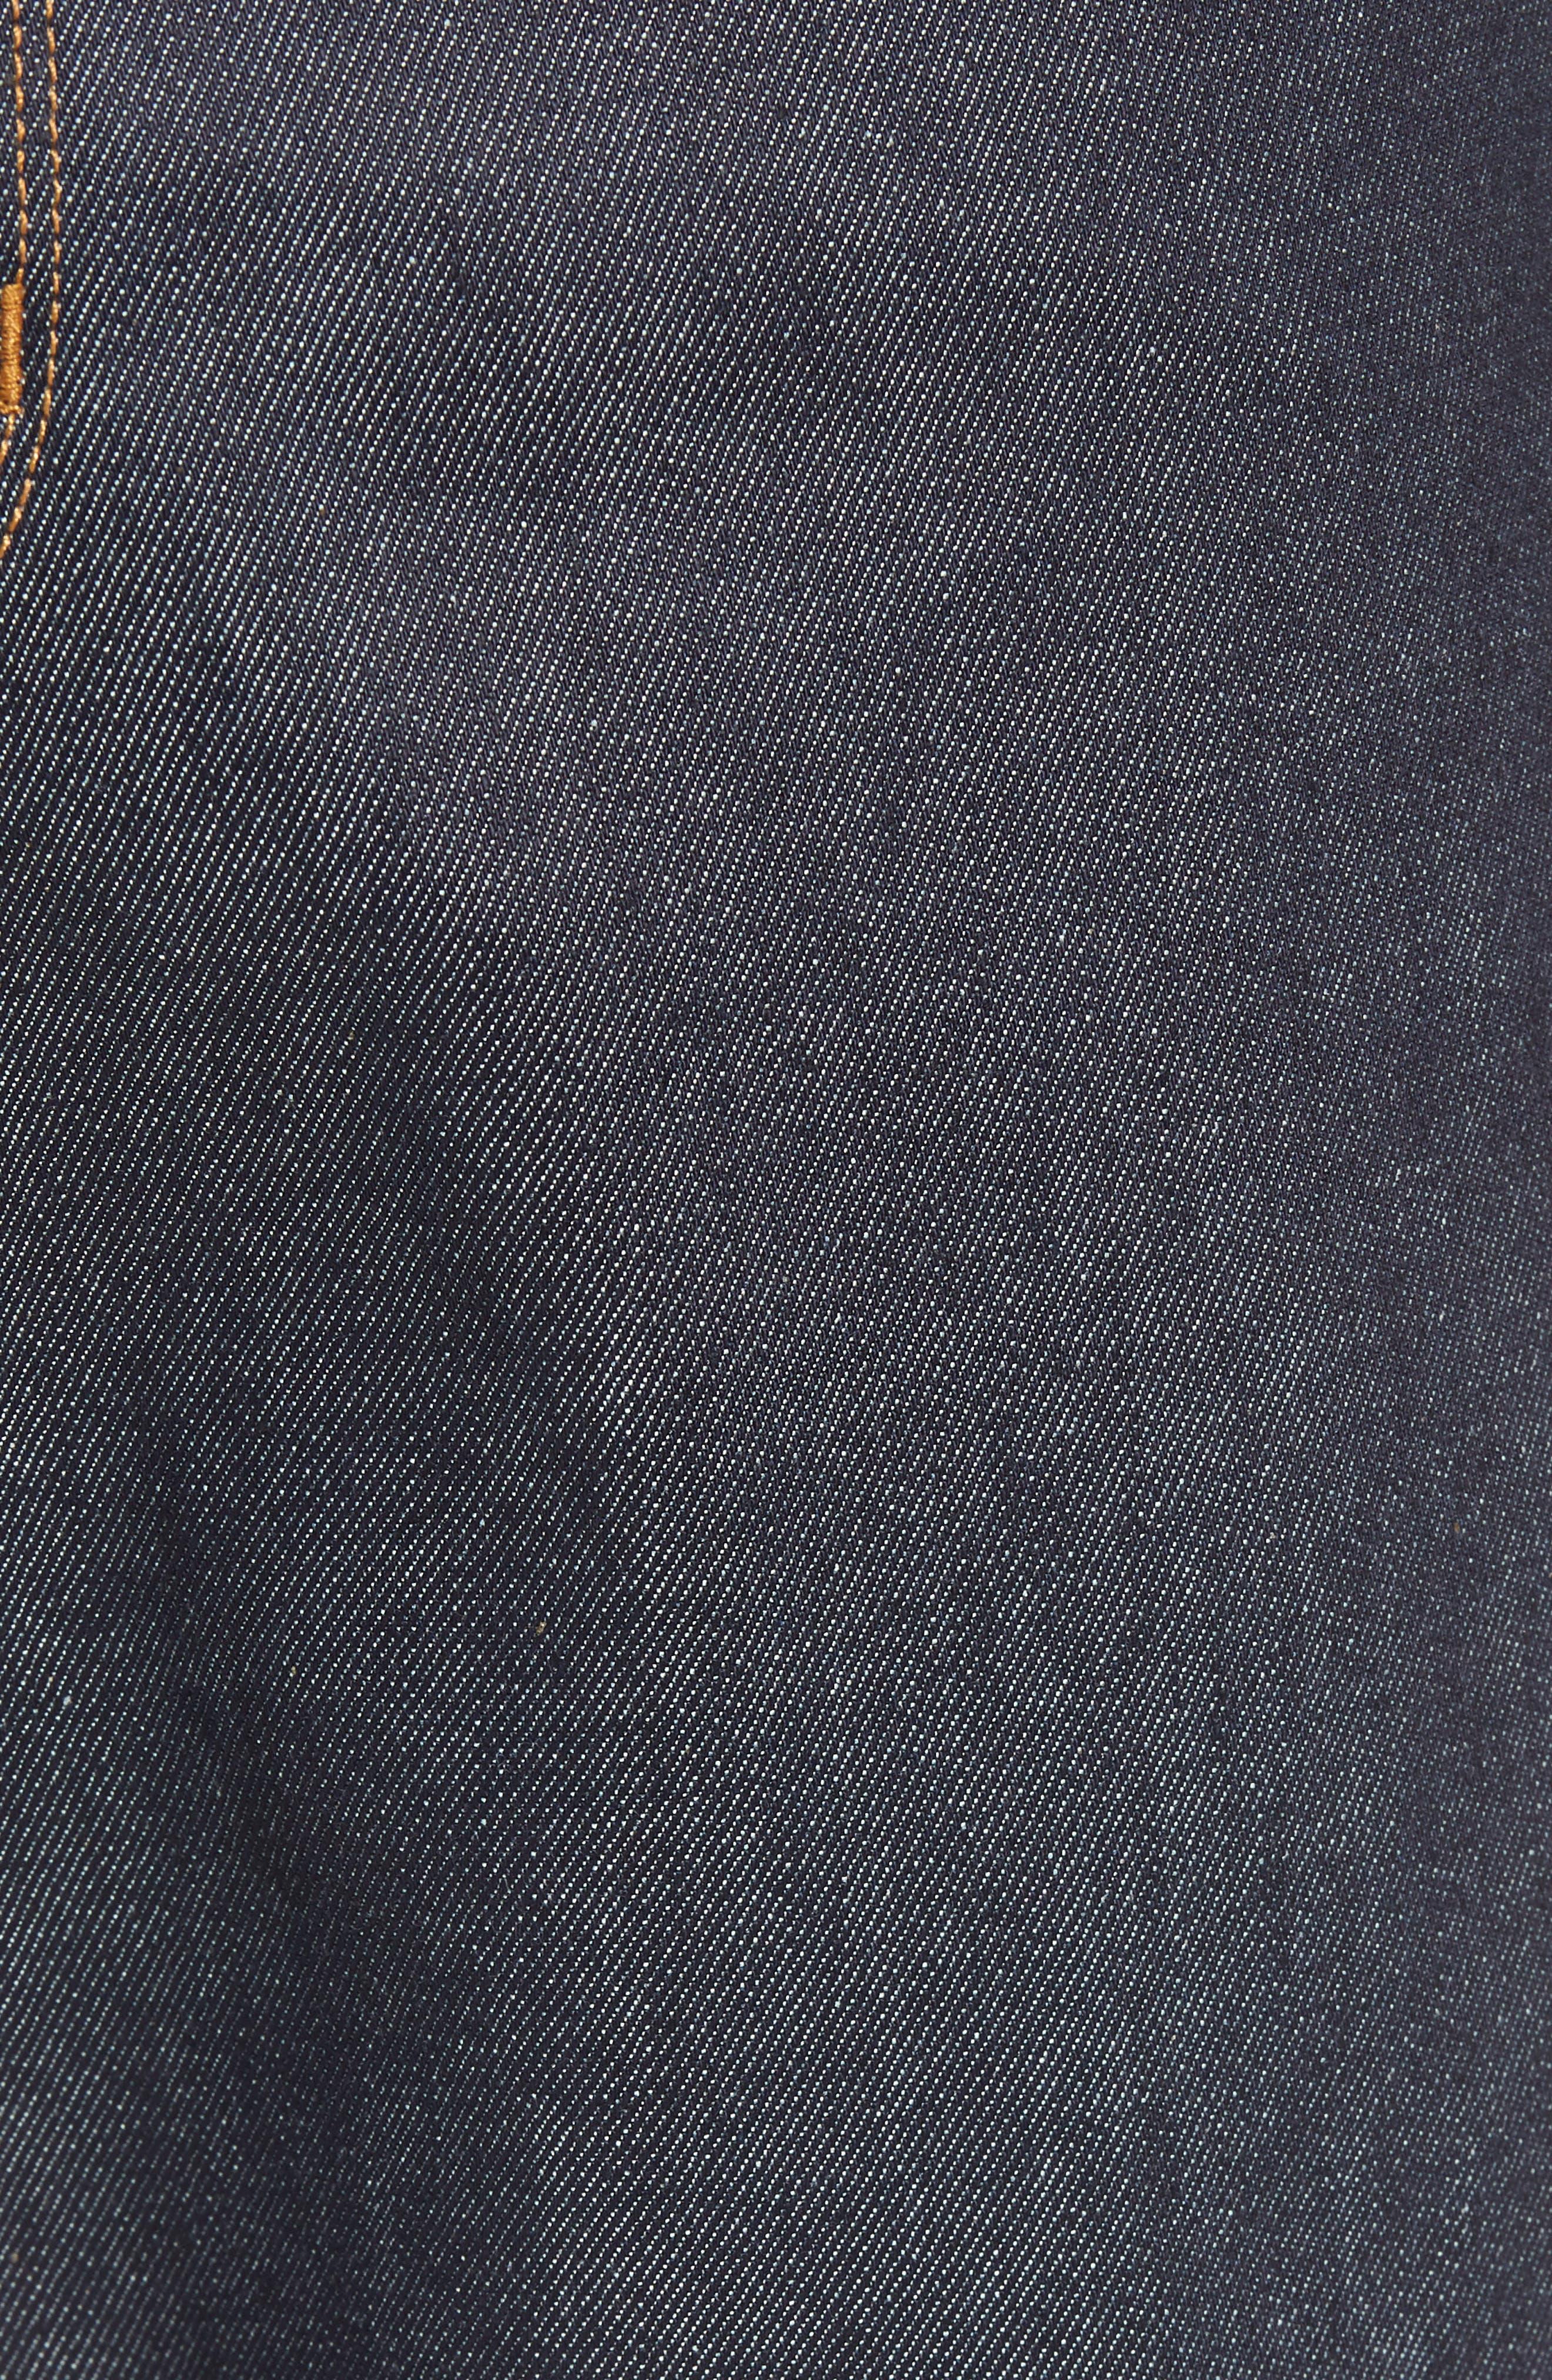 Sartor Skinny Fit Jeans,                             Alternate thumbnail 5, color,                             RAW